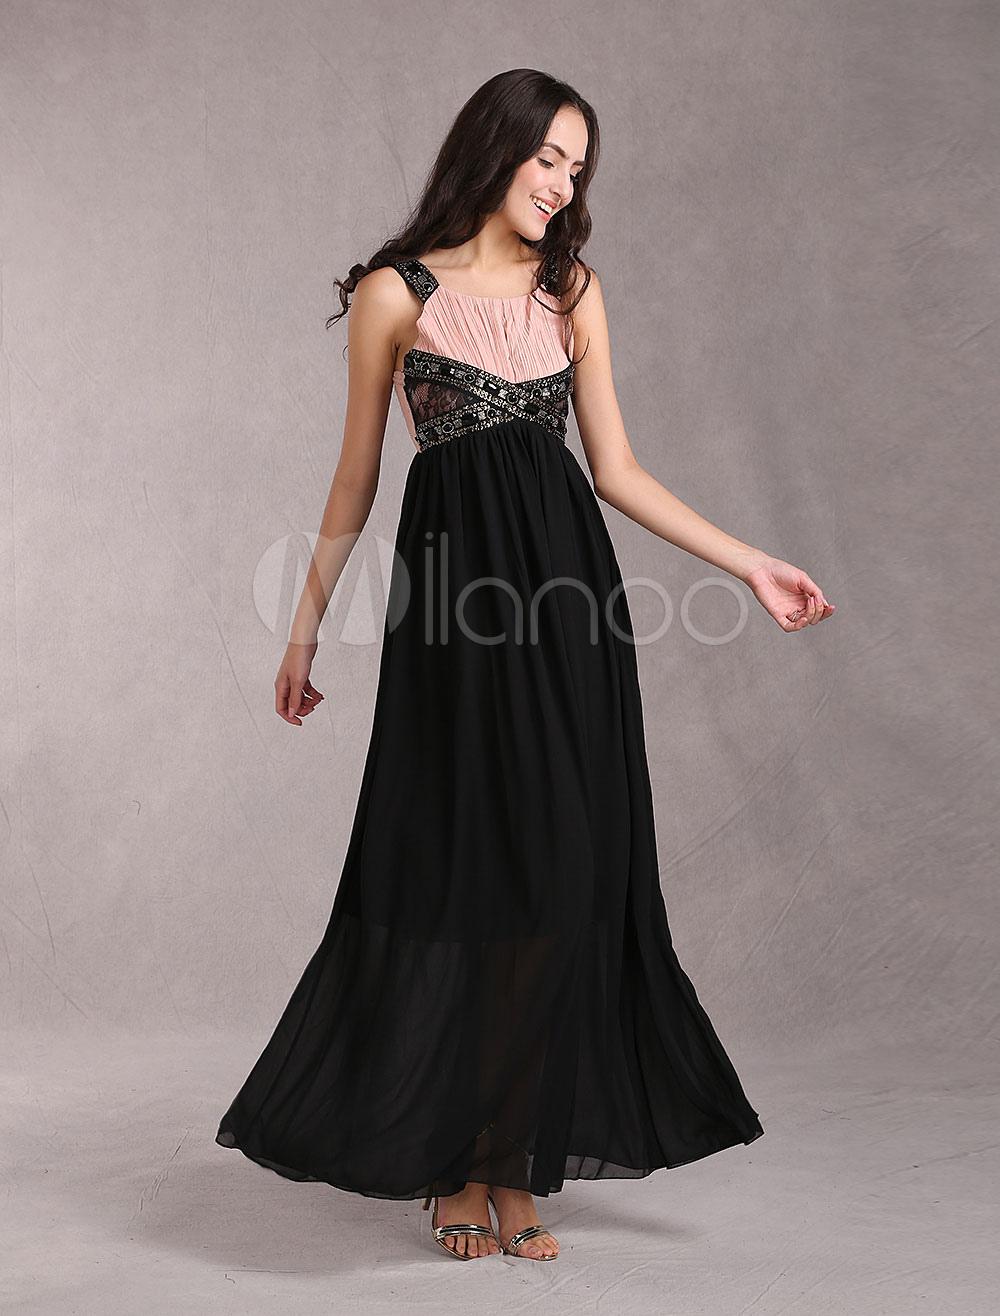 robe longue de soir e gracieuse en chiffon avec sangle. Black Bedroom Furniture Sets. Home Design Ideas